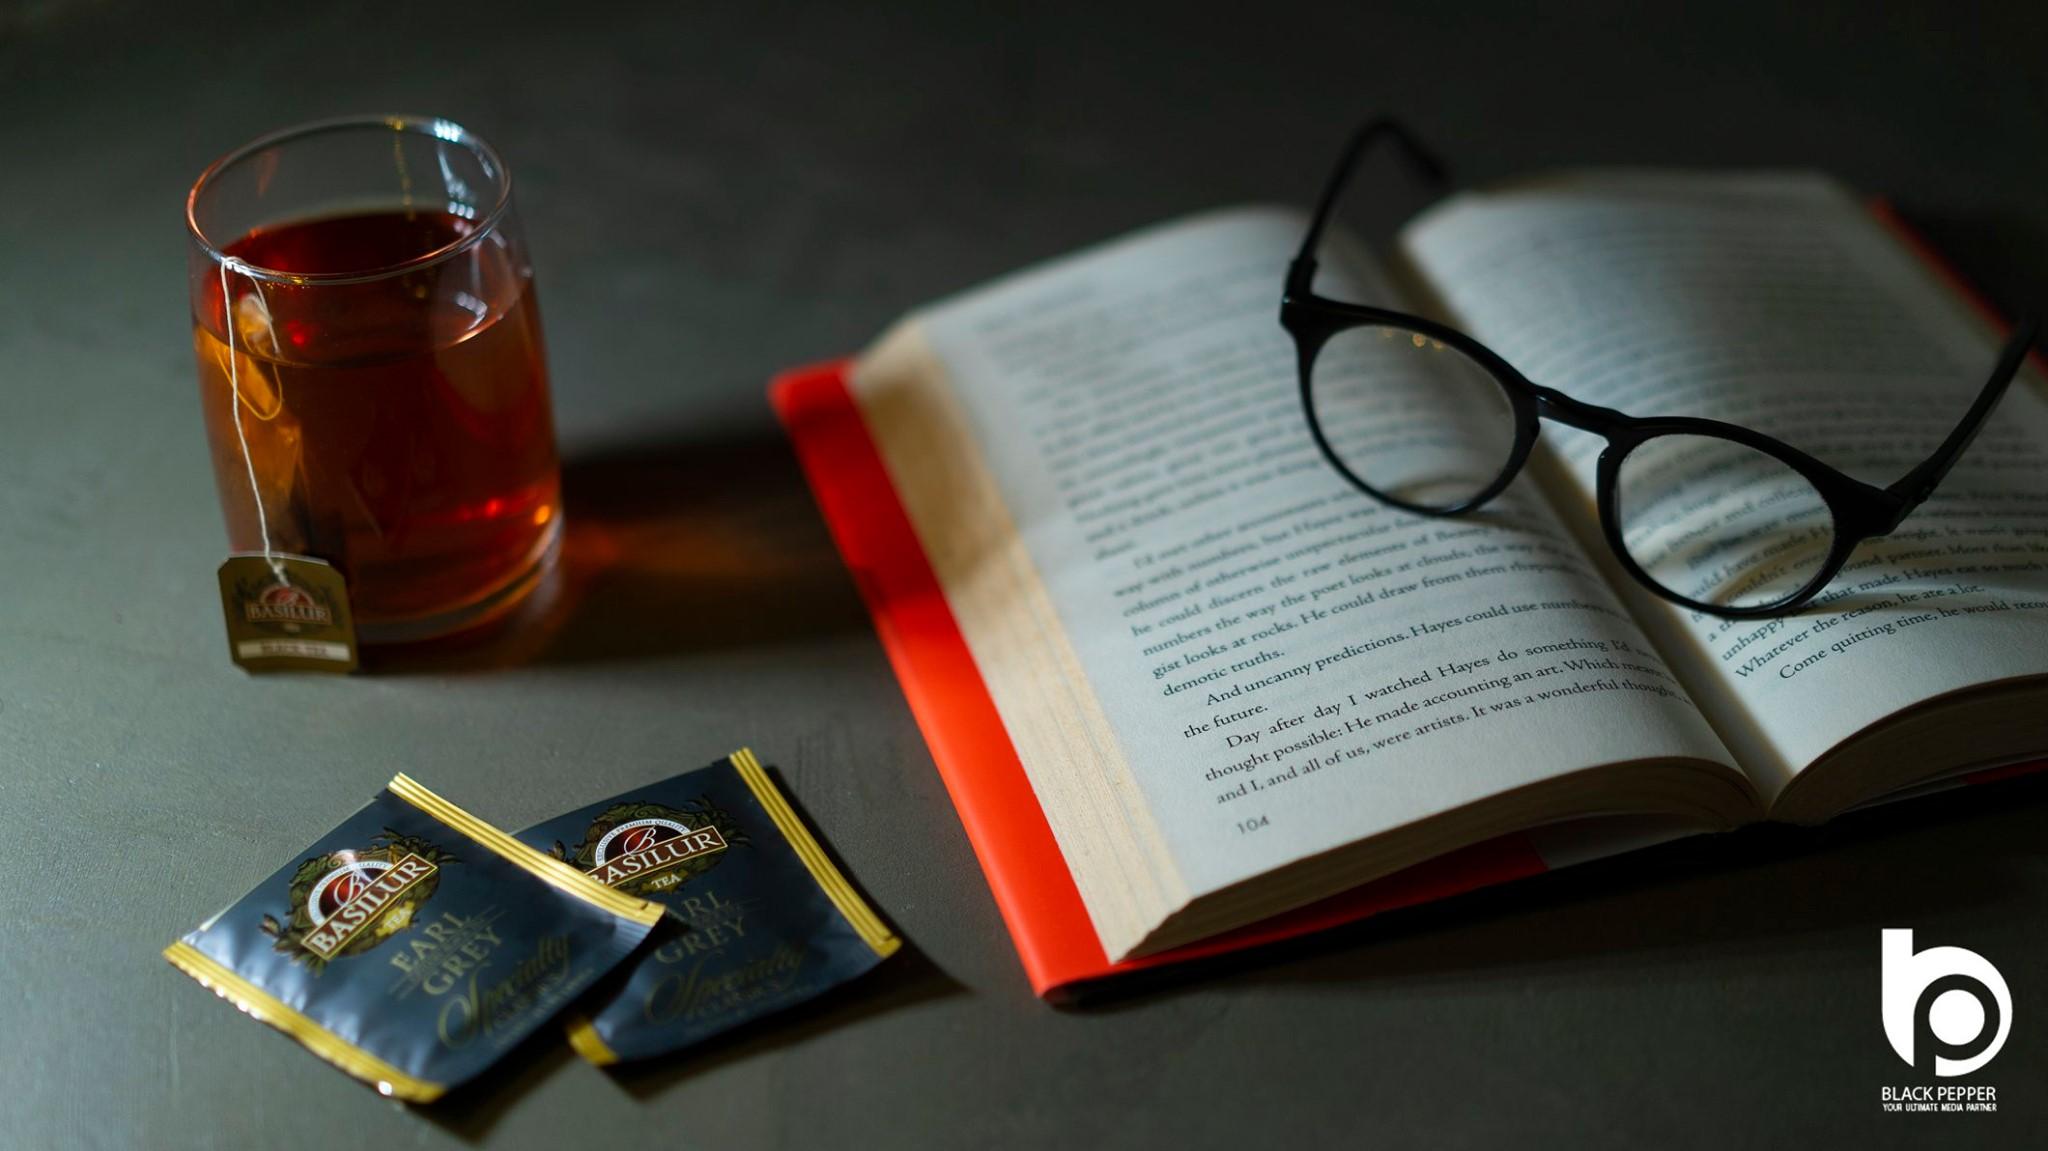 Earl Grey Tea - Sri lanka